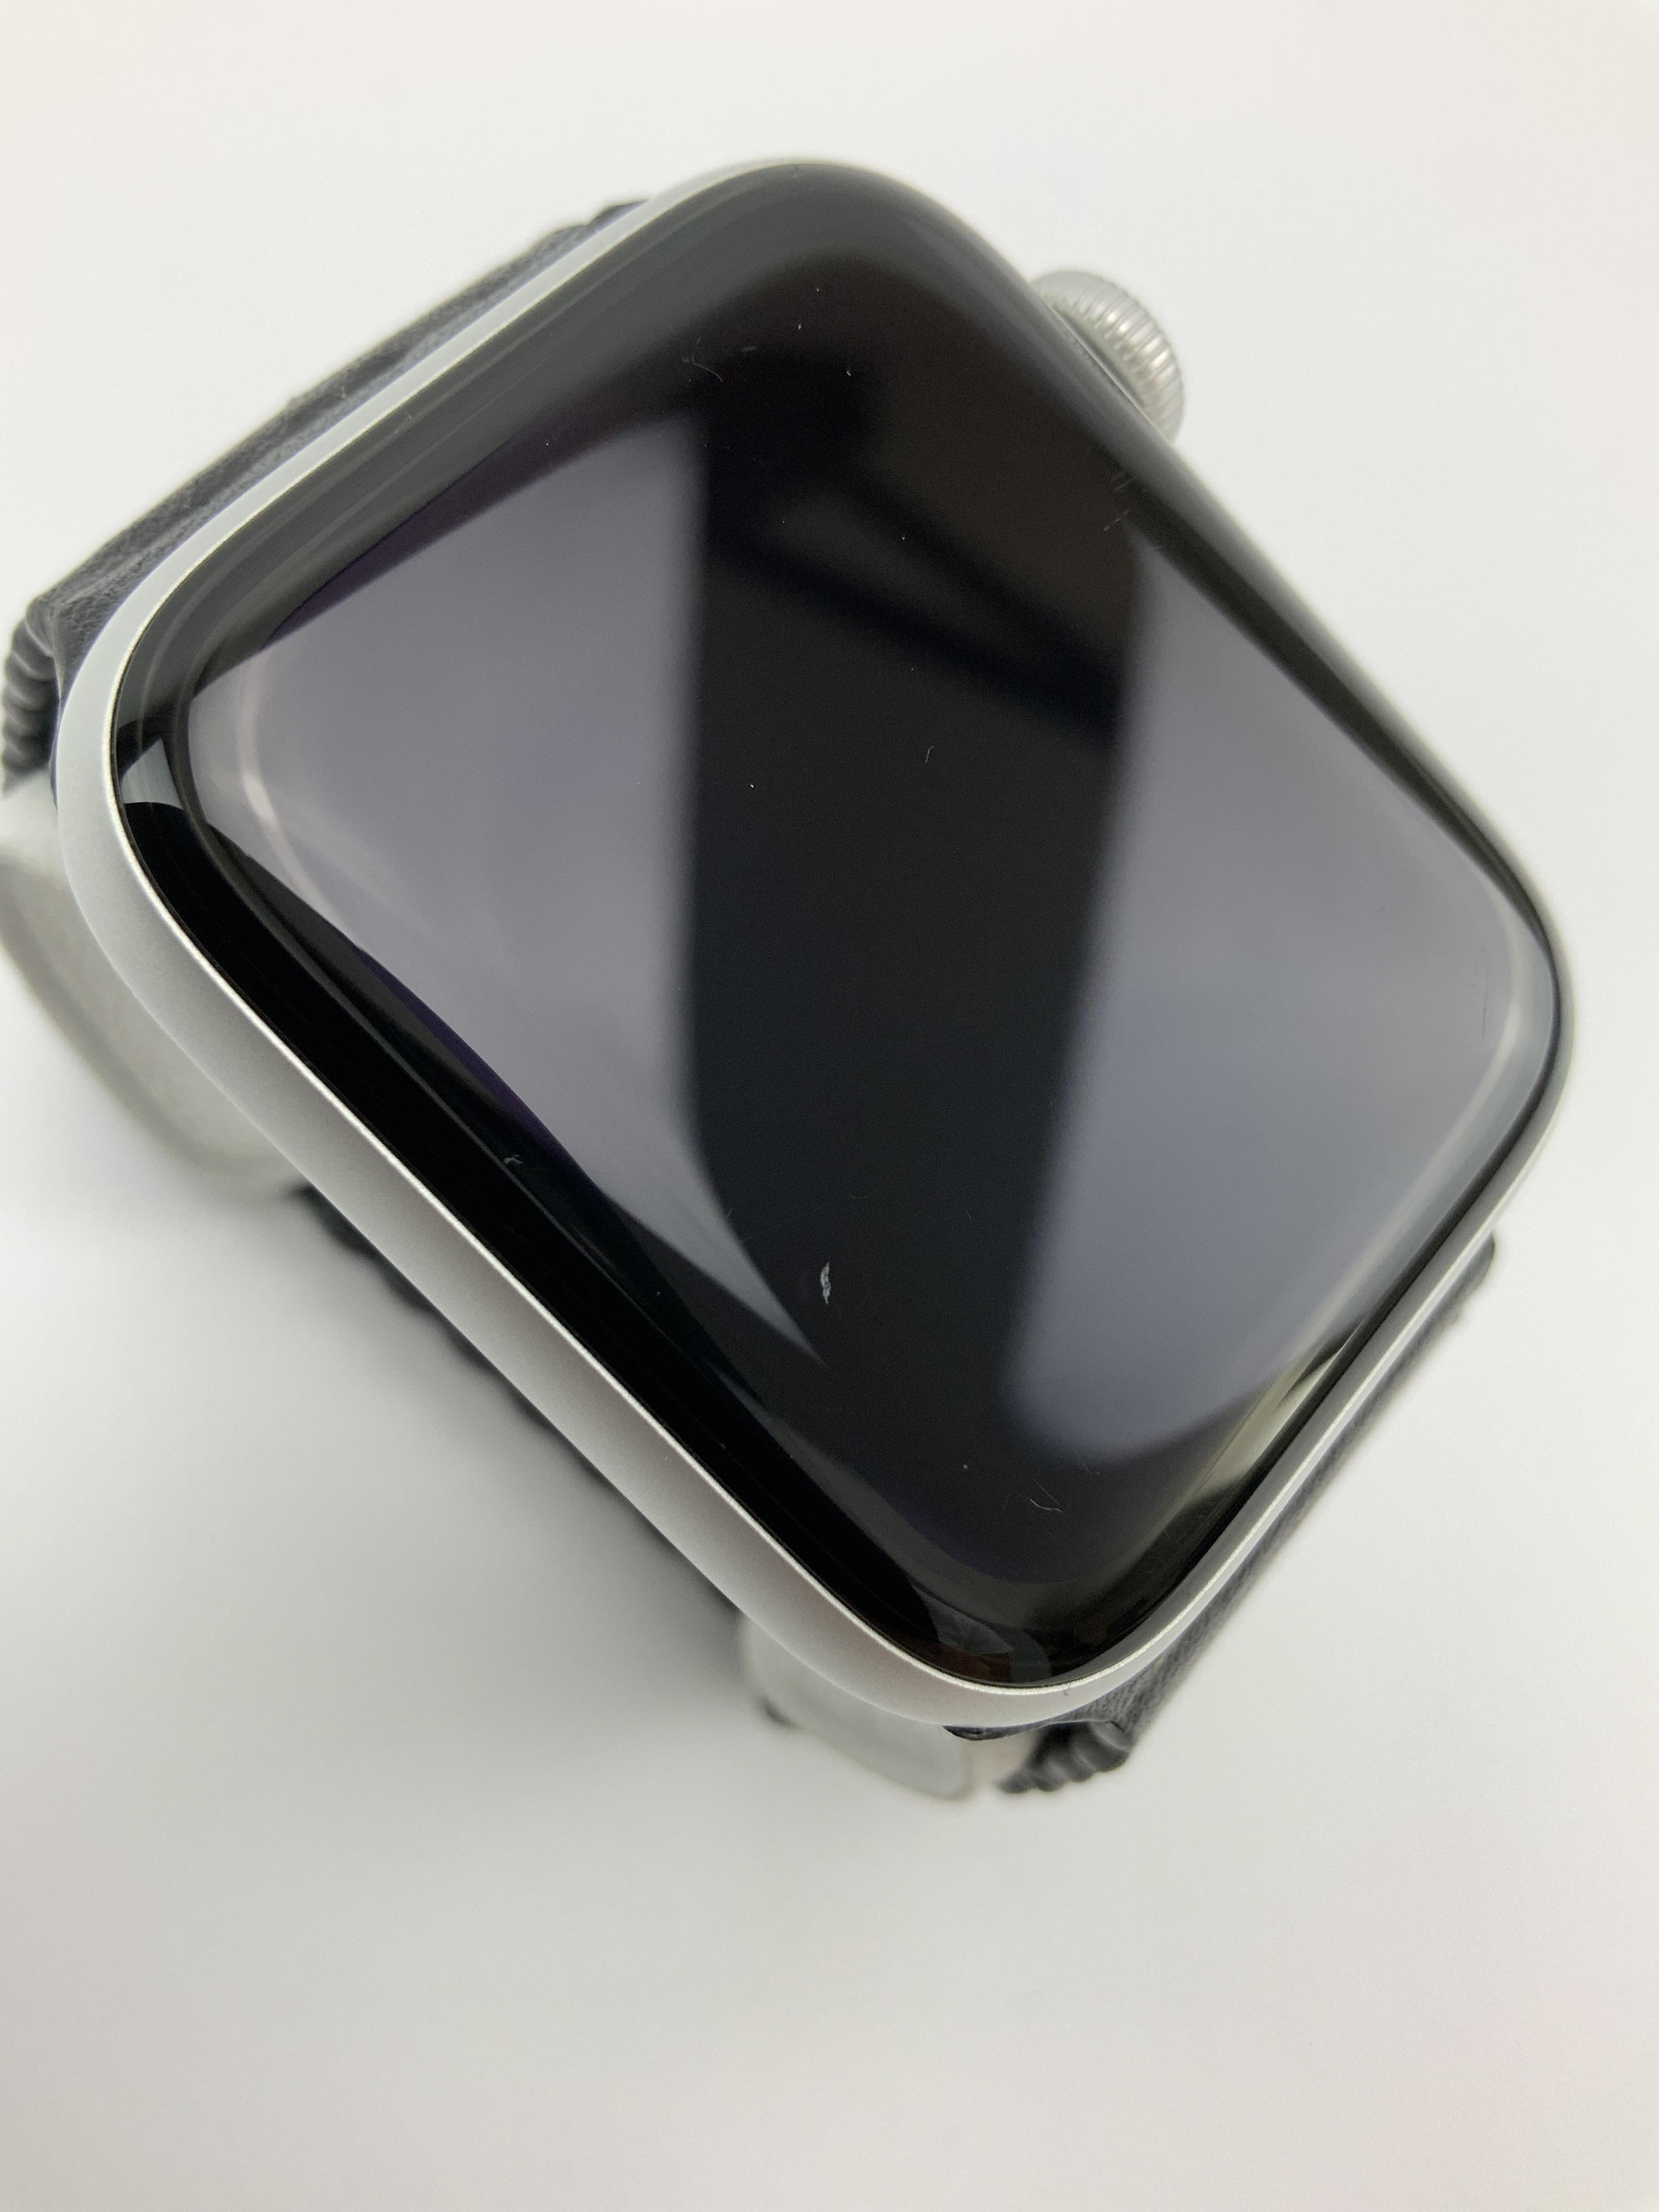 Watch Series 5 Aluminum (44mm), Silver, obraz 3